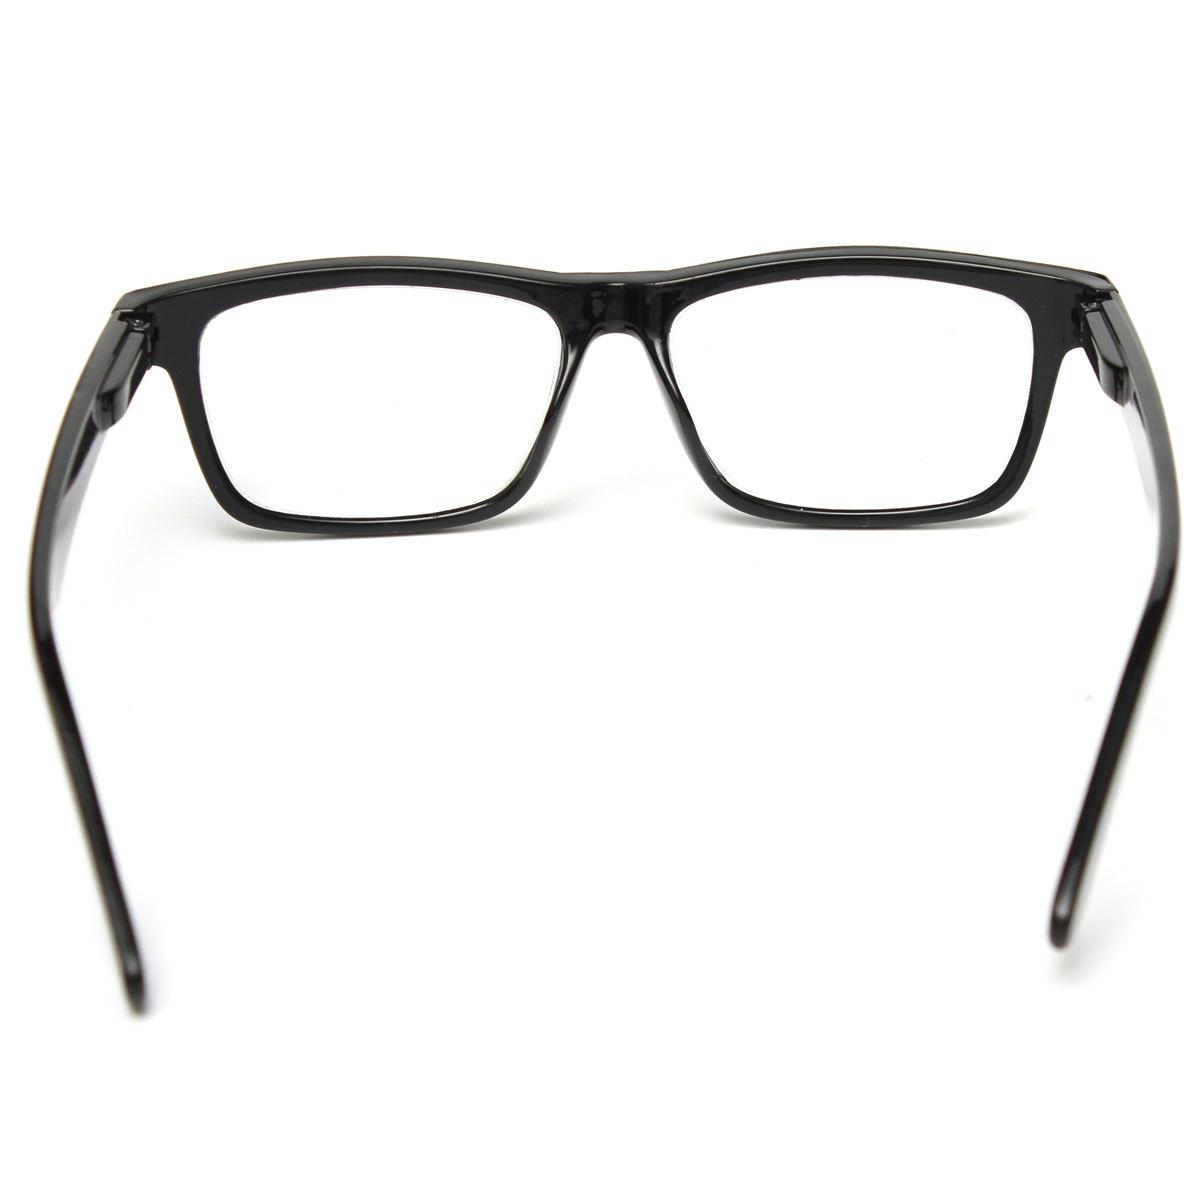 Kacamata Baca Pria Wanita Cahaya Presbyopic Klasik Hitam Perbatasan Pembaca Kacamata + 3 .